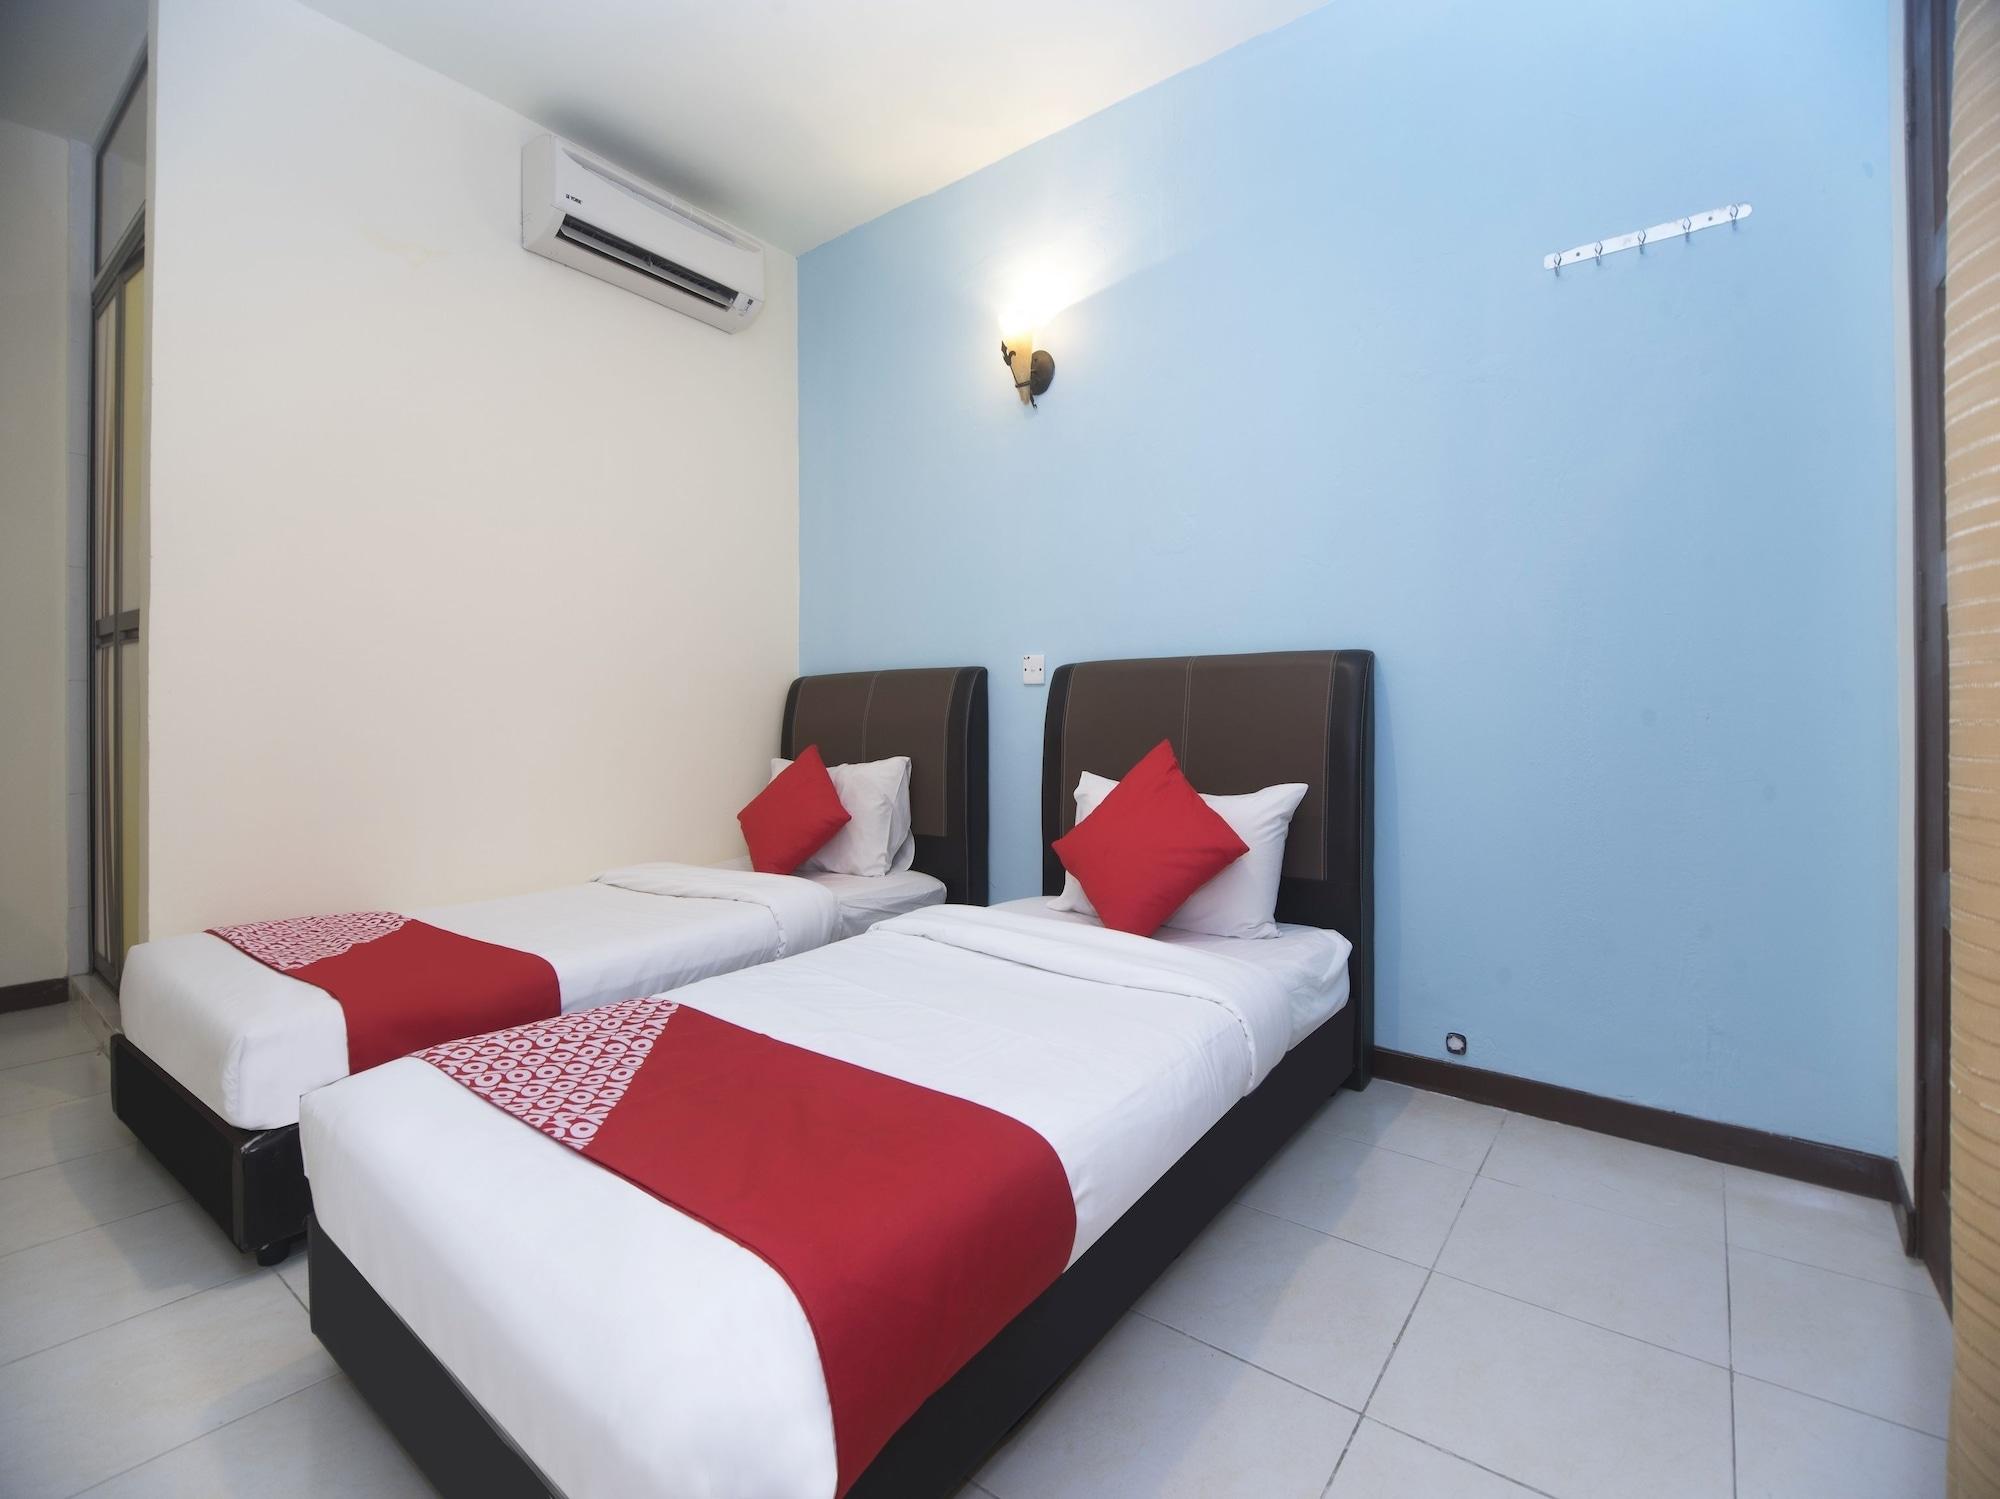 OYO 1149 Feringghi Hotel, Pulau Penang